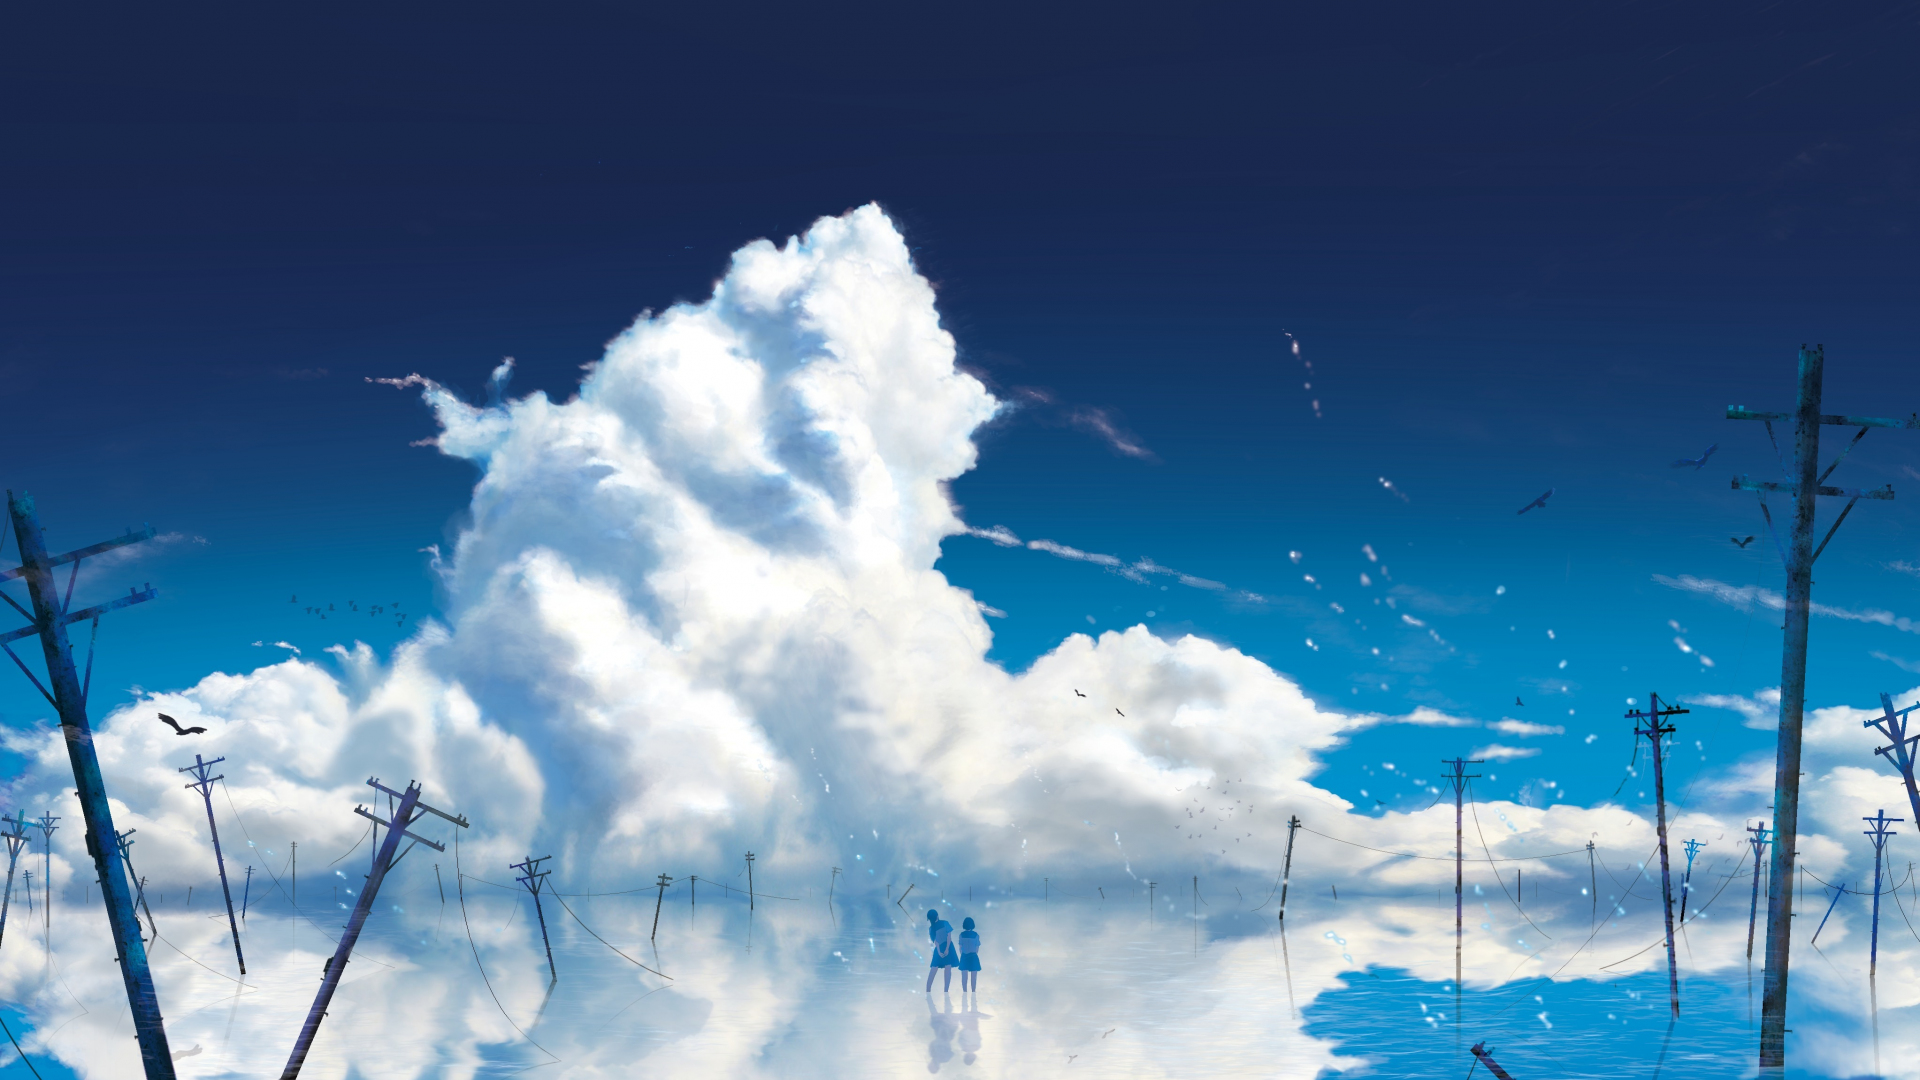 Anime girls, outdoor, clouds, 1920x1080 wallpaper